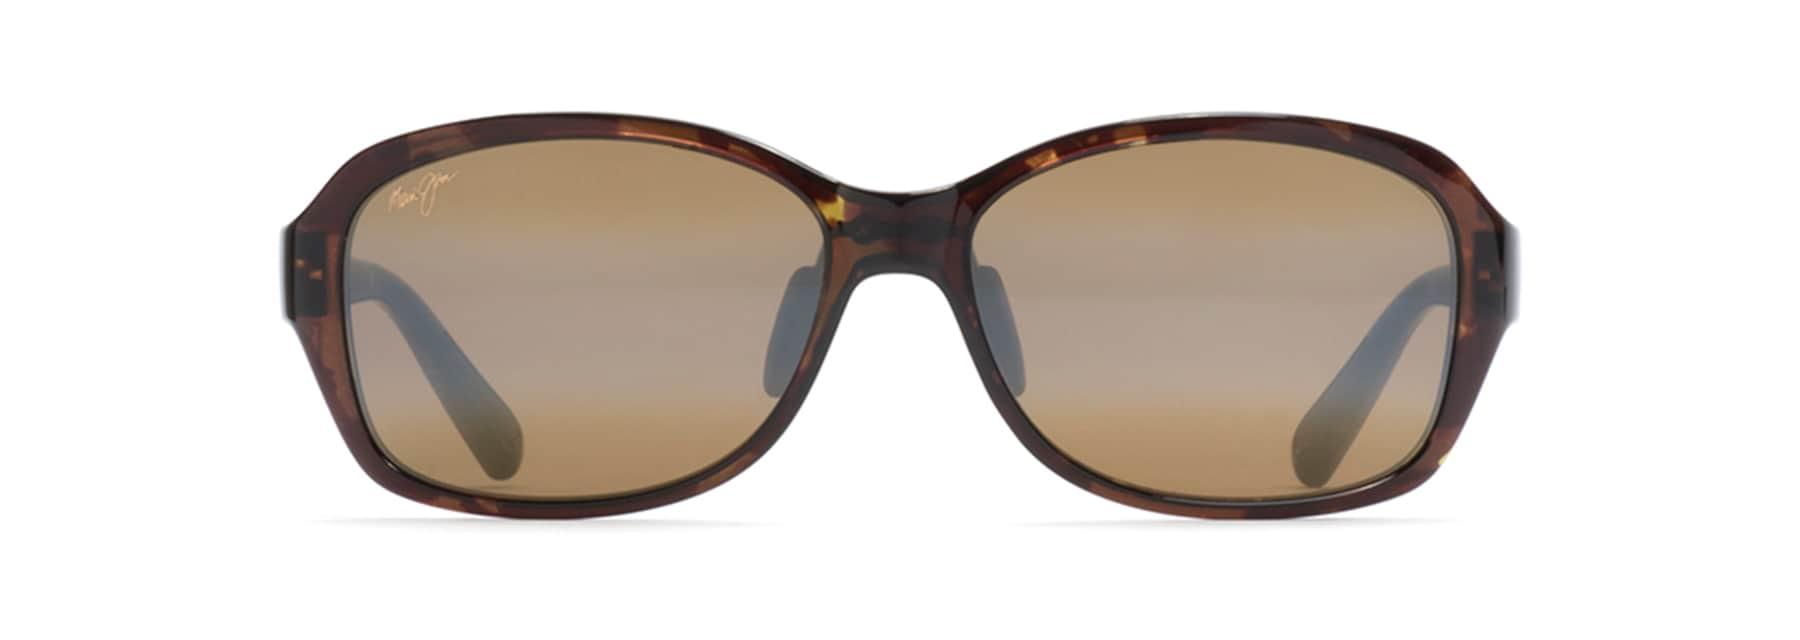 f4aa53fd20b35 KOKI BEACH. Polarized Fashion Sunglasses